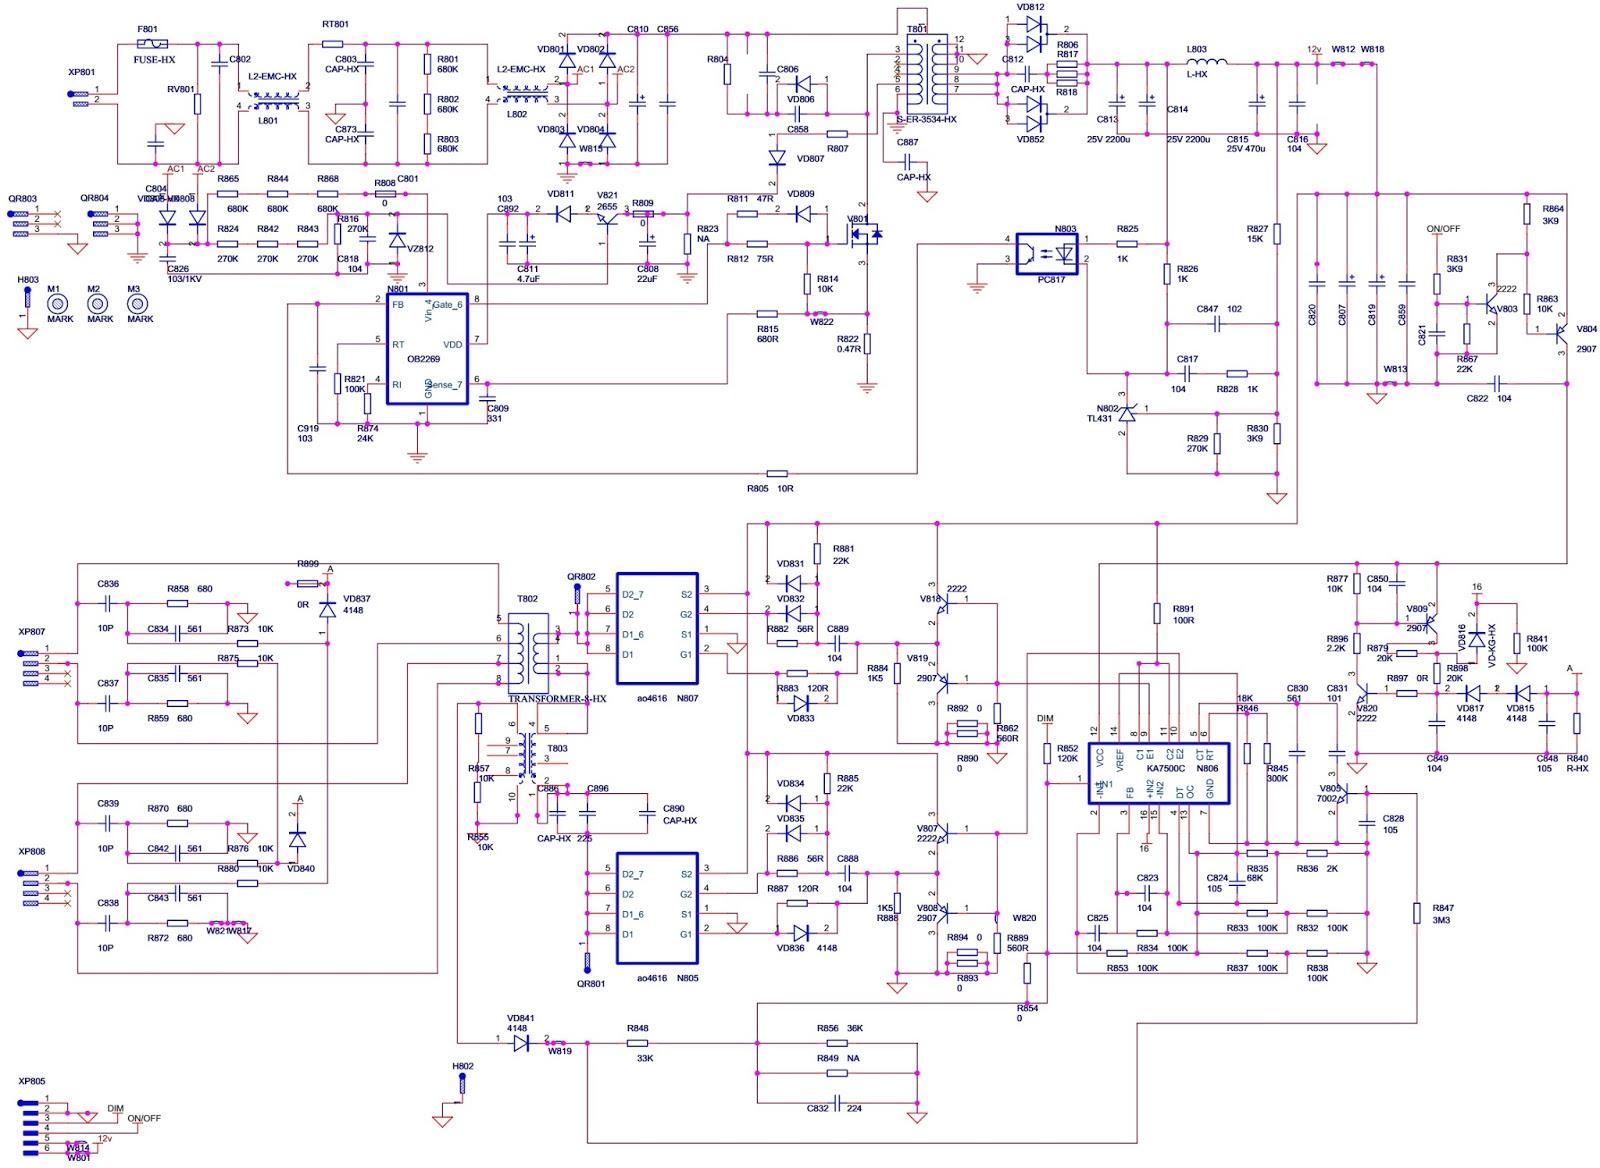 Laptop Adapter Circuit Diagram Bablu 1988 s10 wiring diagrams ...